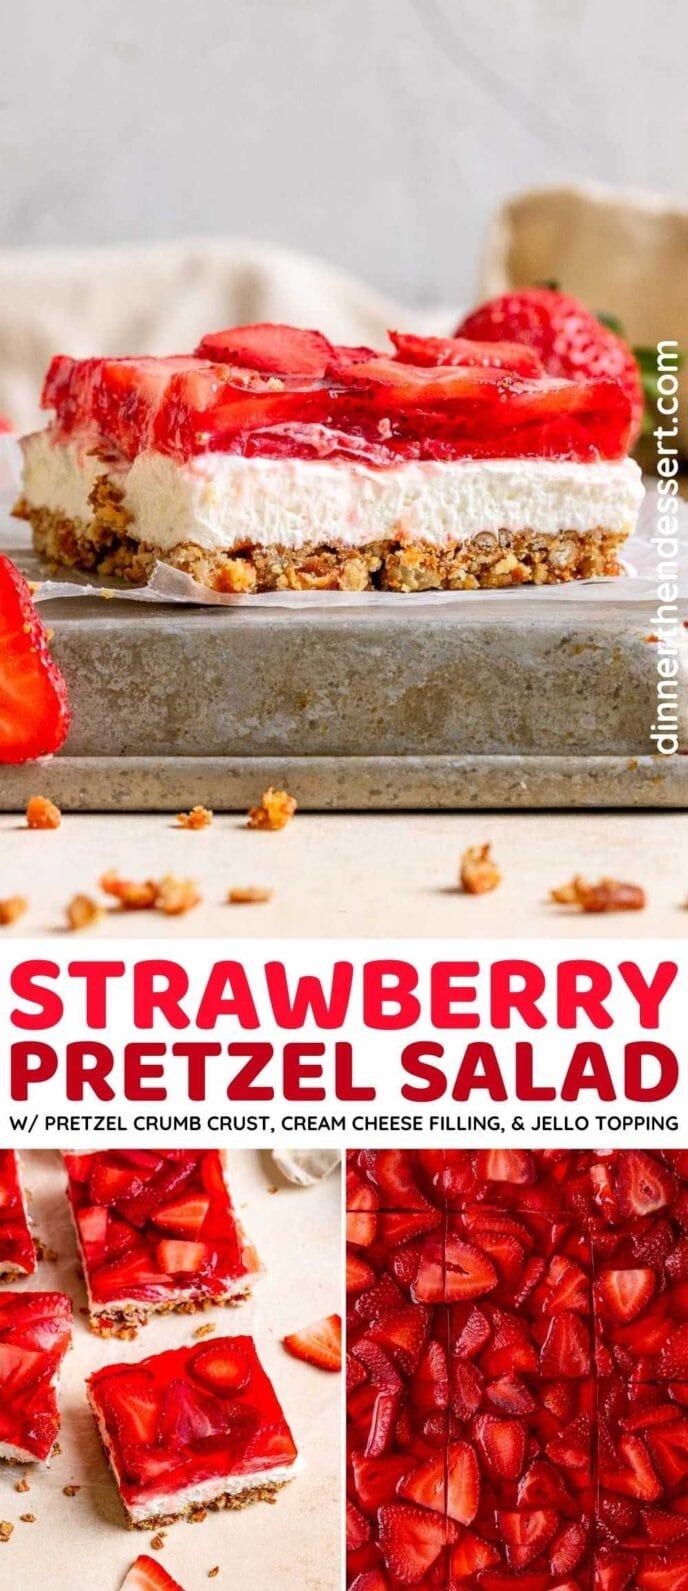 Strawberry Pretzel Salad collage